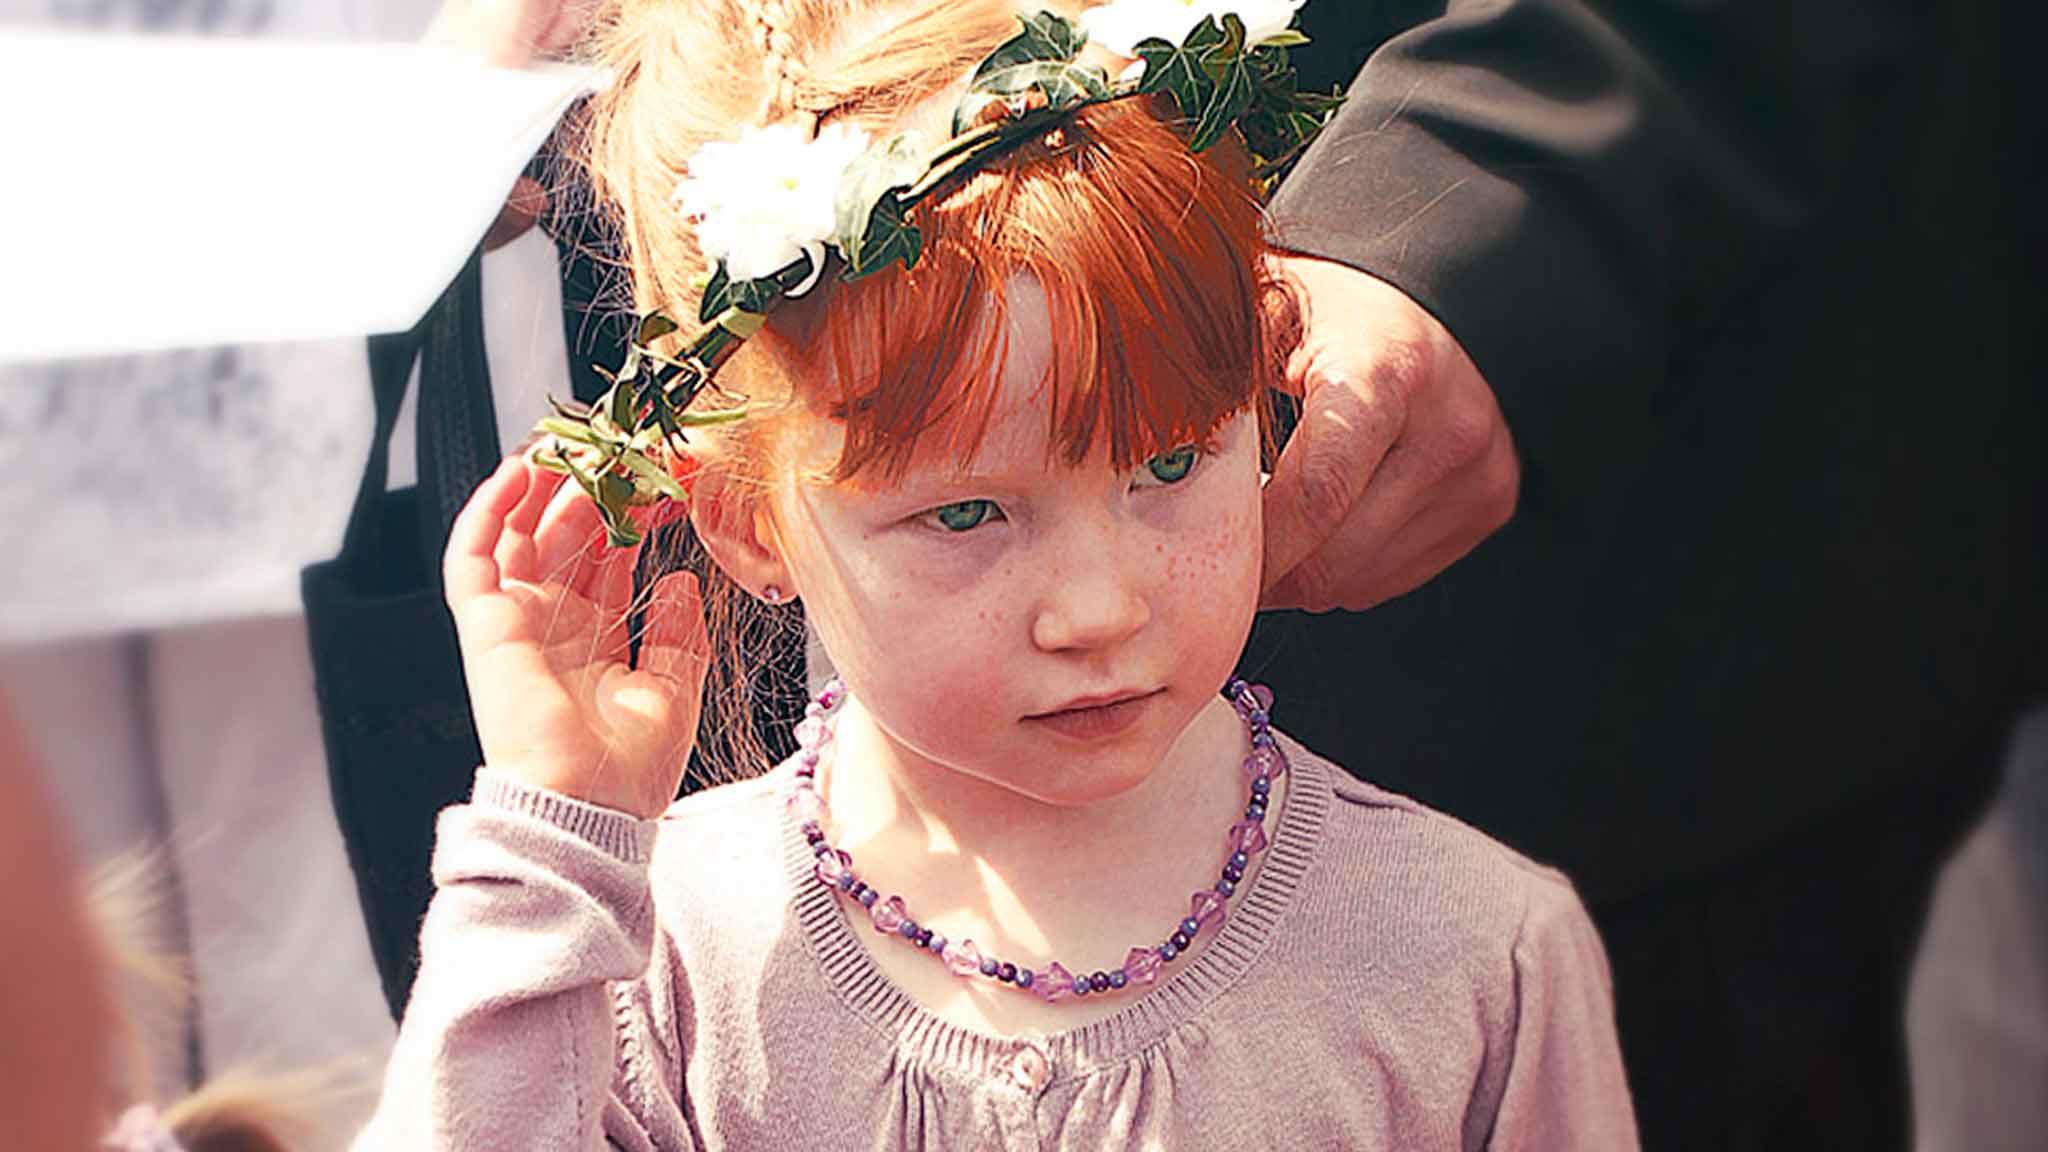 redhead-girl-bridesmaid-demoiselle-honneur-photographe-mariage-wedding-photographer